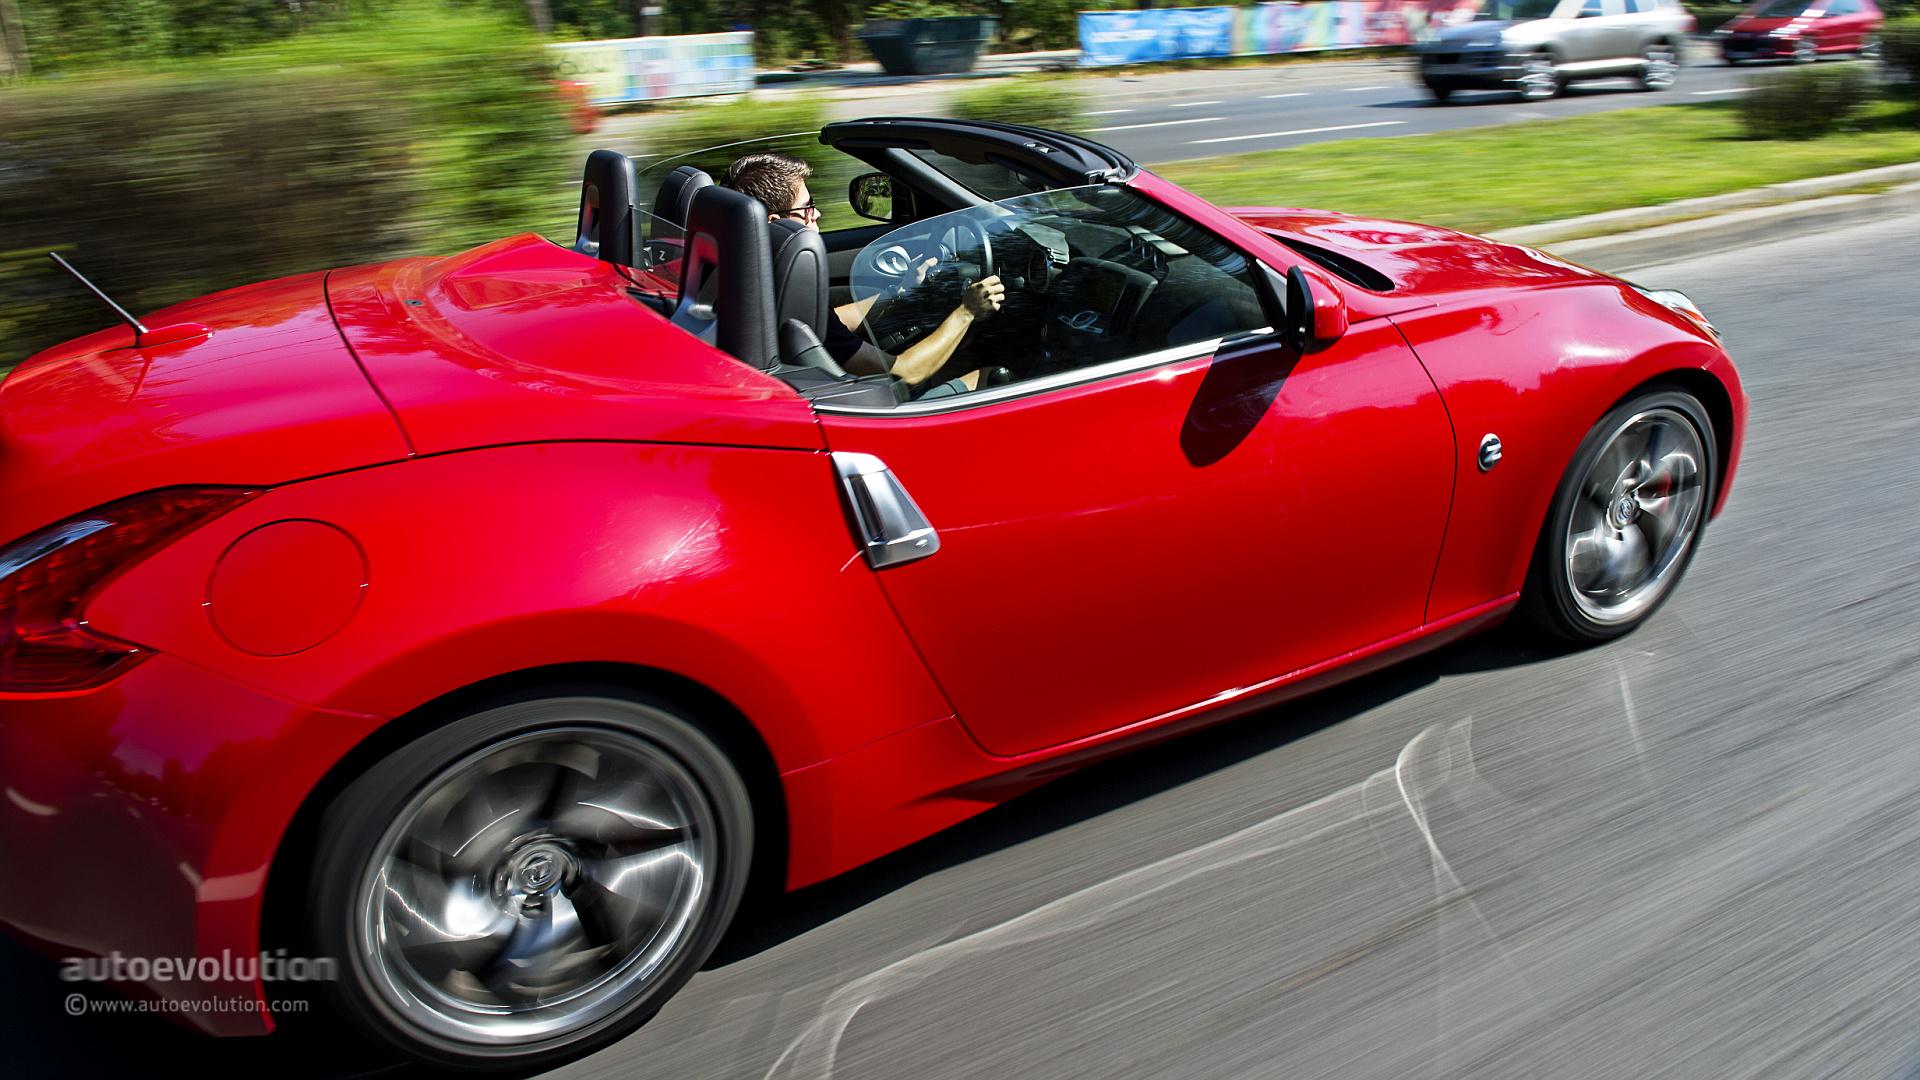 2014 nissan 370z roadster review autoevolution. Black Bedroom Furniture Sets. Home Design Ideas